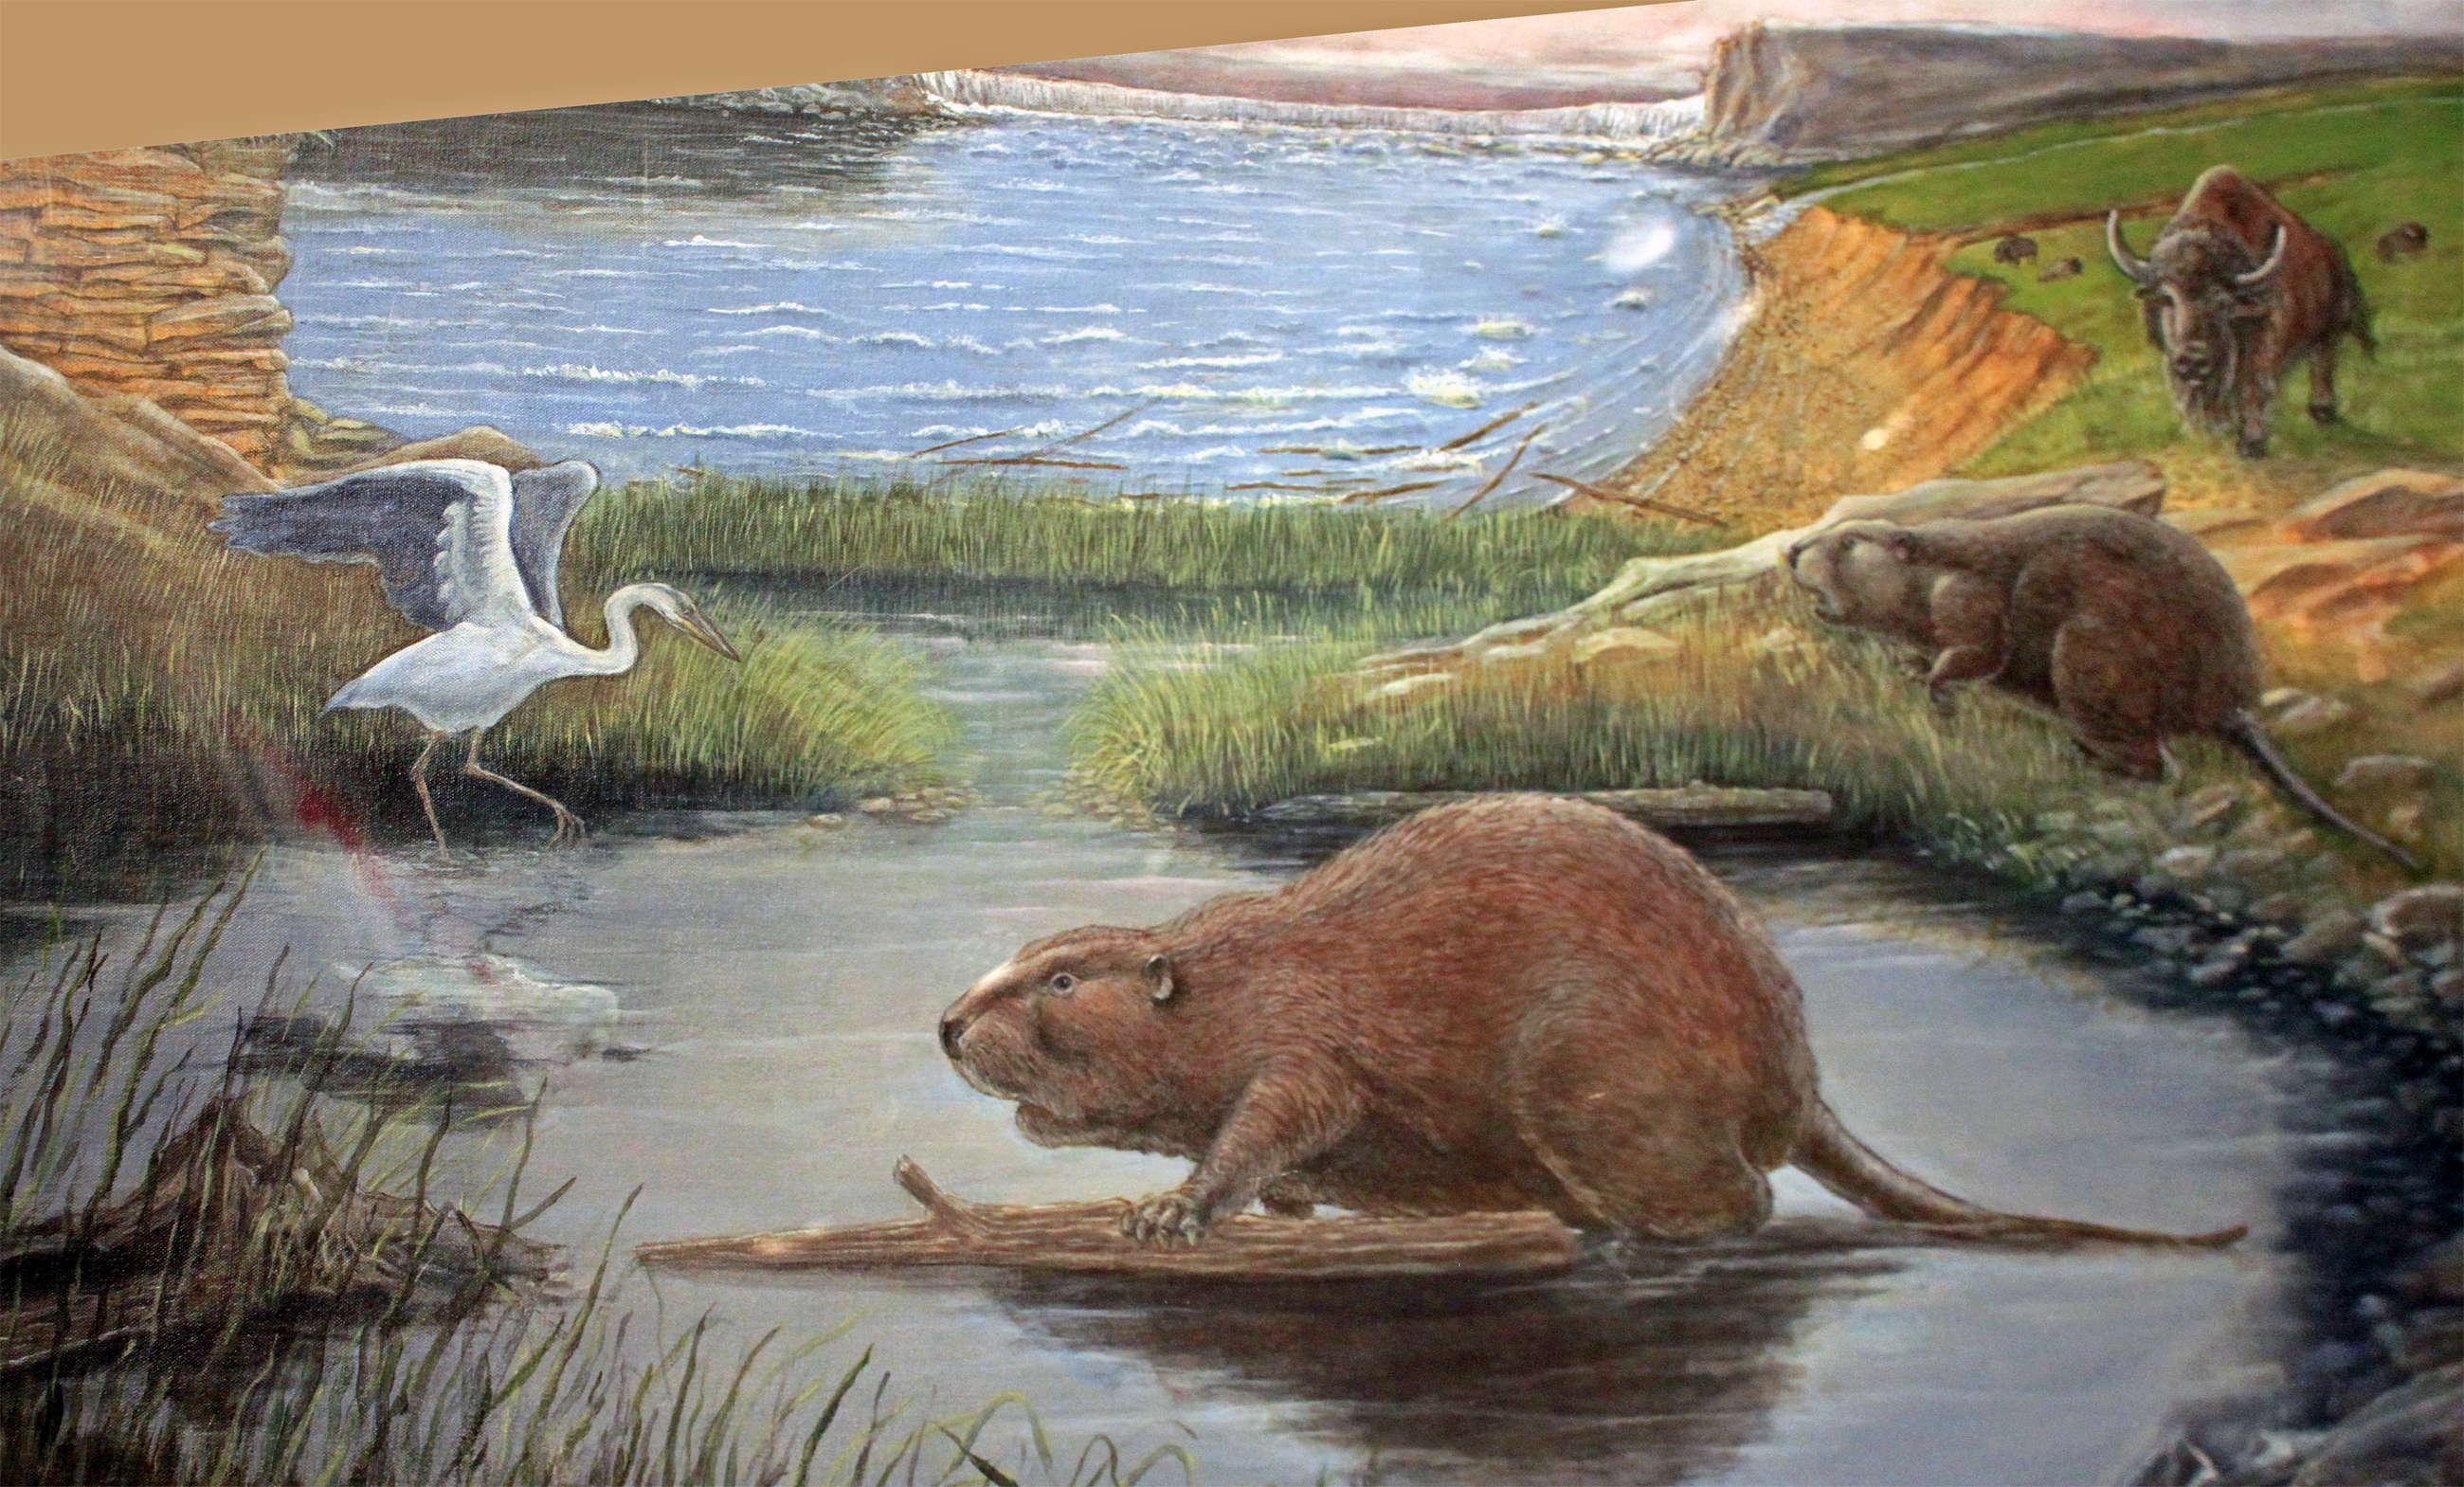 giant animals north america - HD2600×1569